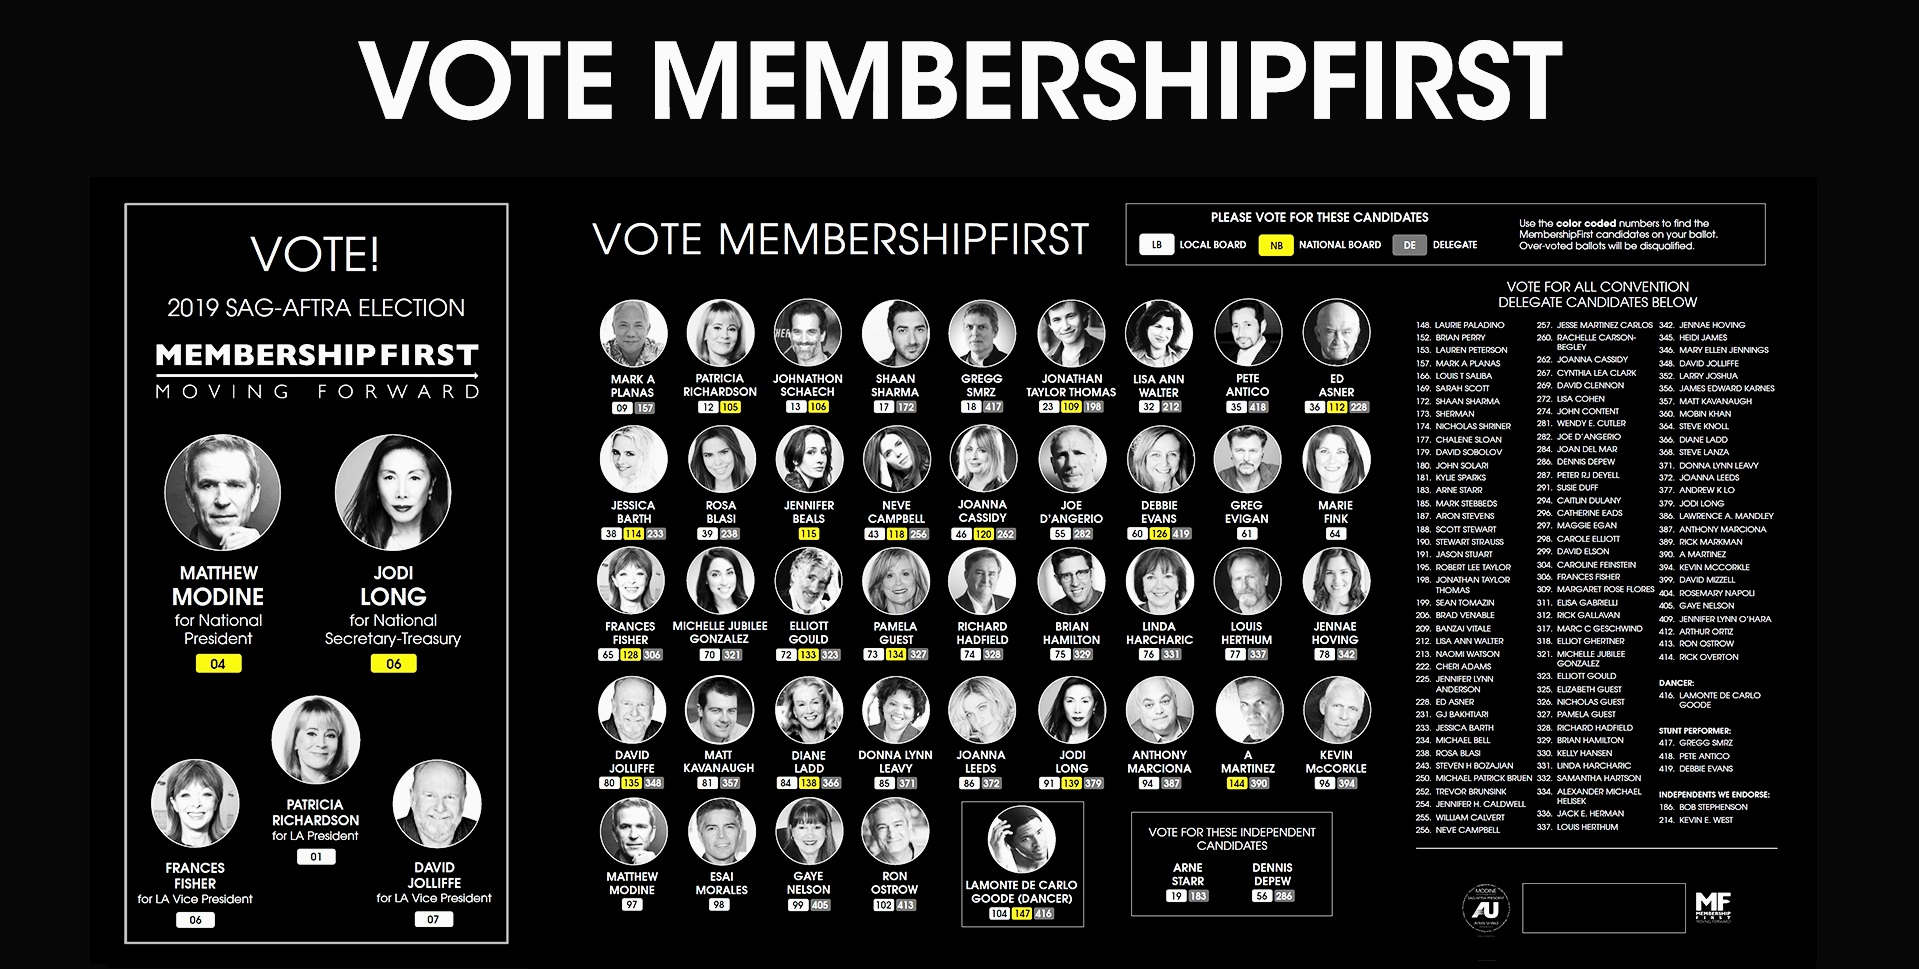 Membership%2BFirst%2B%2BCandidates%2B2019%2B.jpg